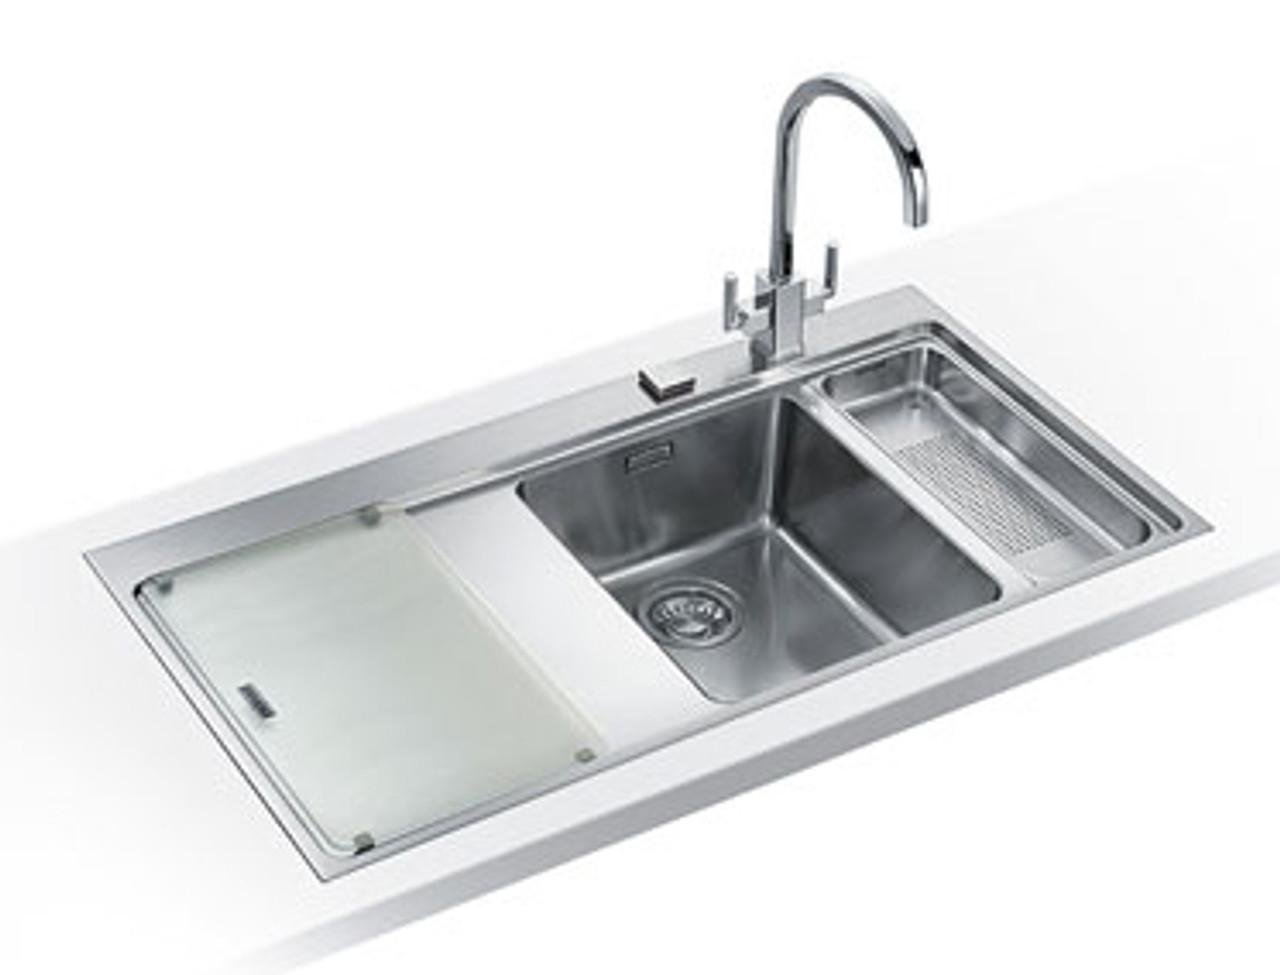 Groovy Franke Mythos Mmx261 Stainless Steel Kitchen Sink Home Interior And Landscaping Ologienasavecom